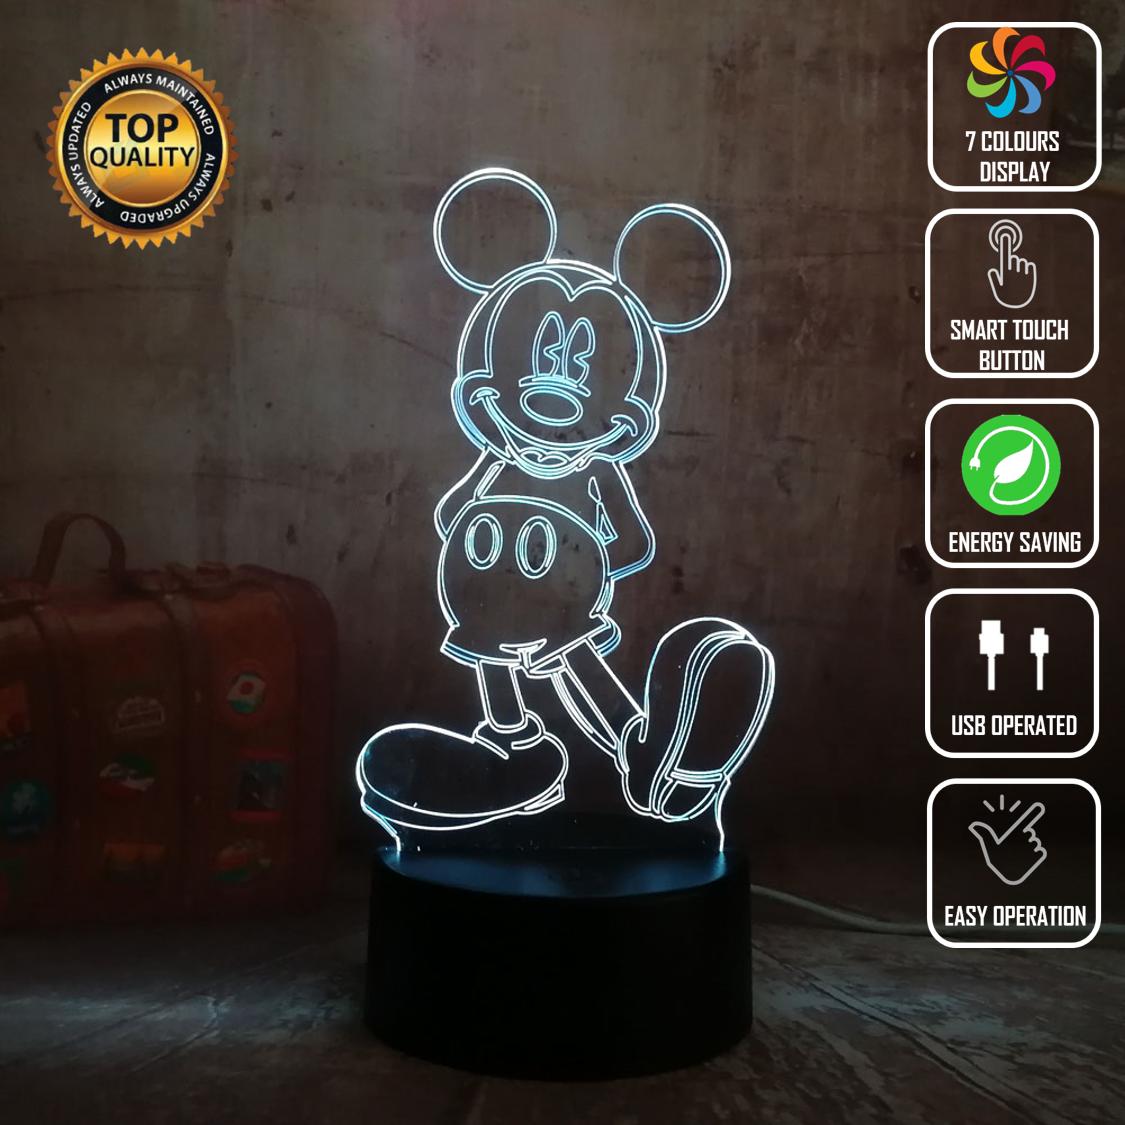 Disney Castle 3D Acrylic LED 7 Colour Night Light Touch Table Desk Lamp Gift